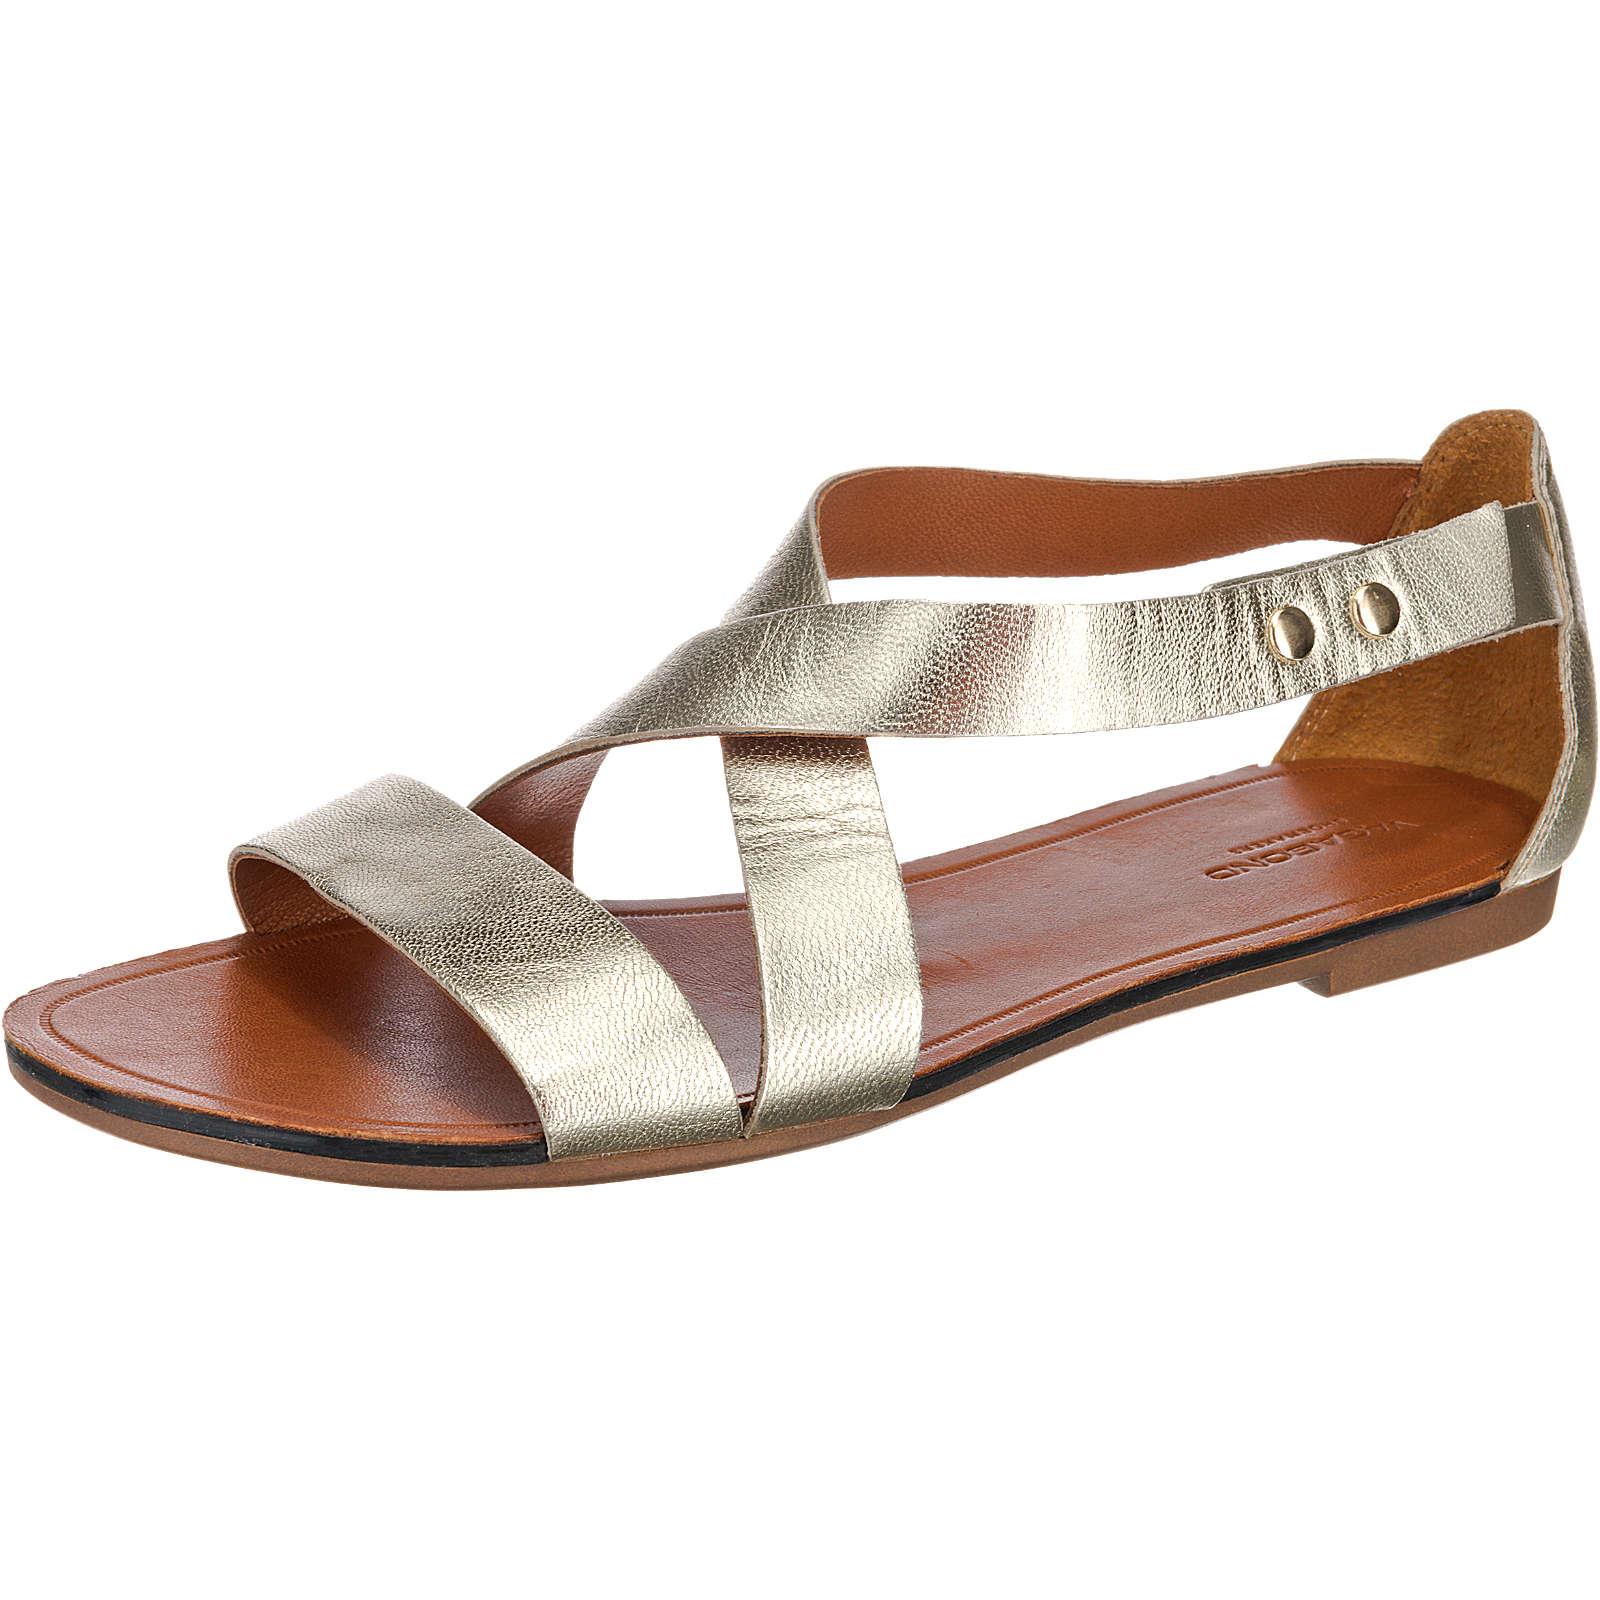 VAGABOND Tia Klassische Sandalen gold Damen Gr. 36